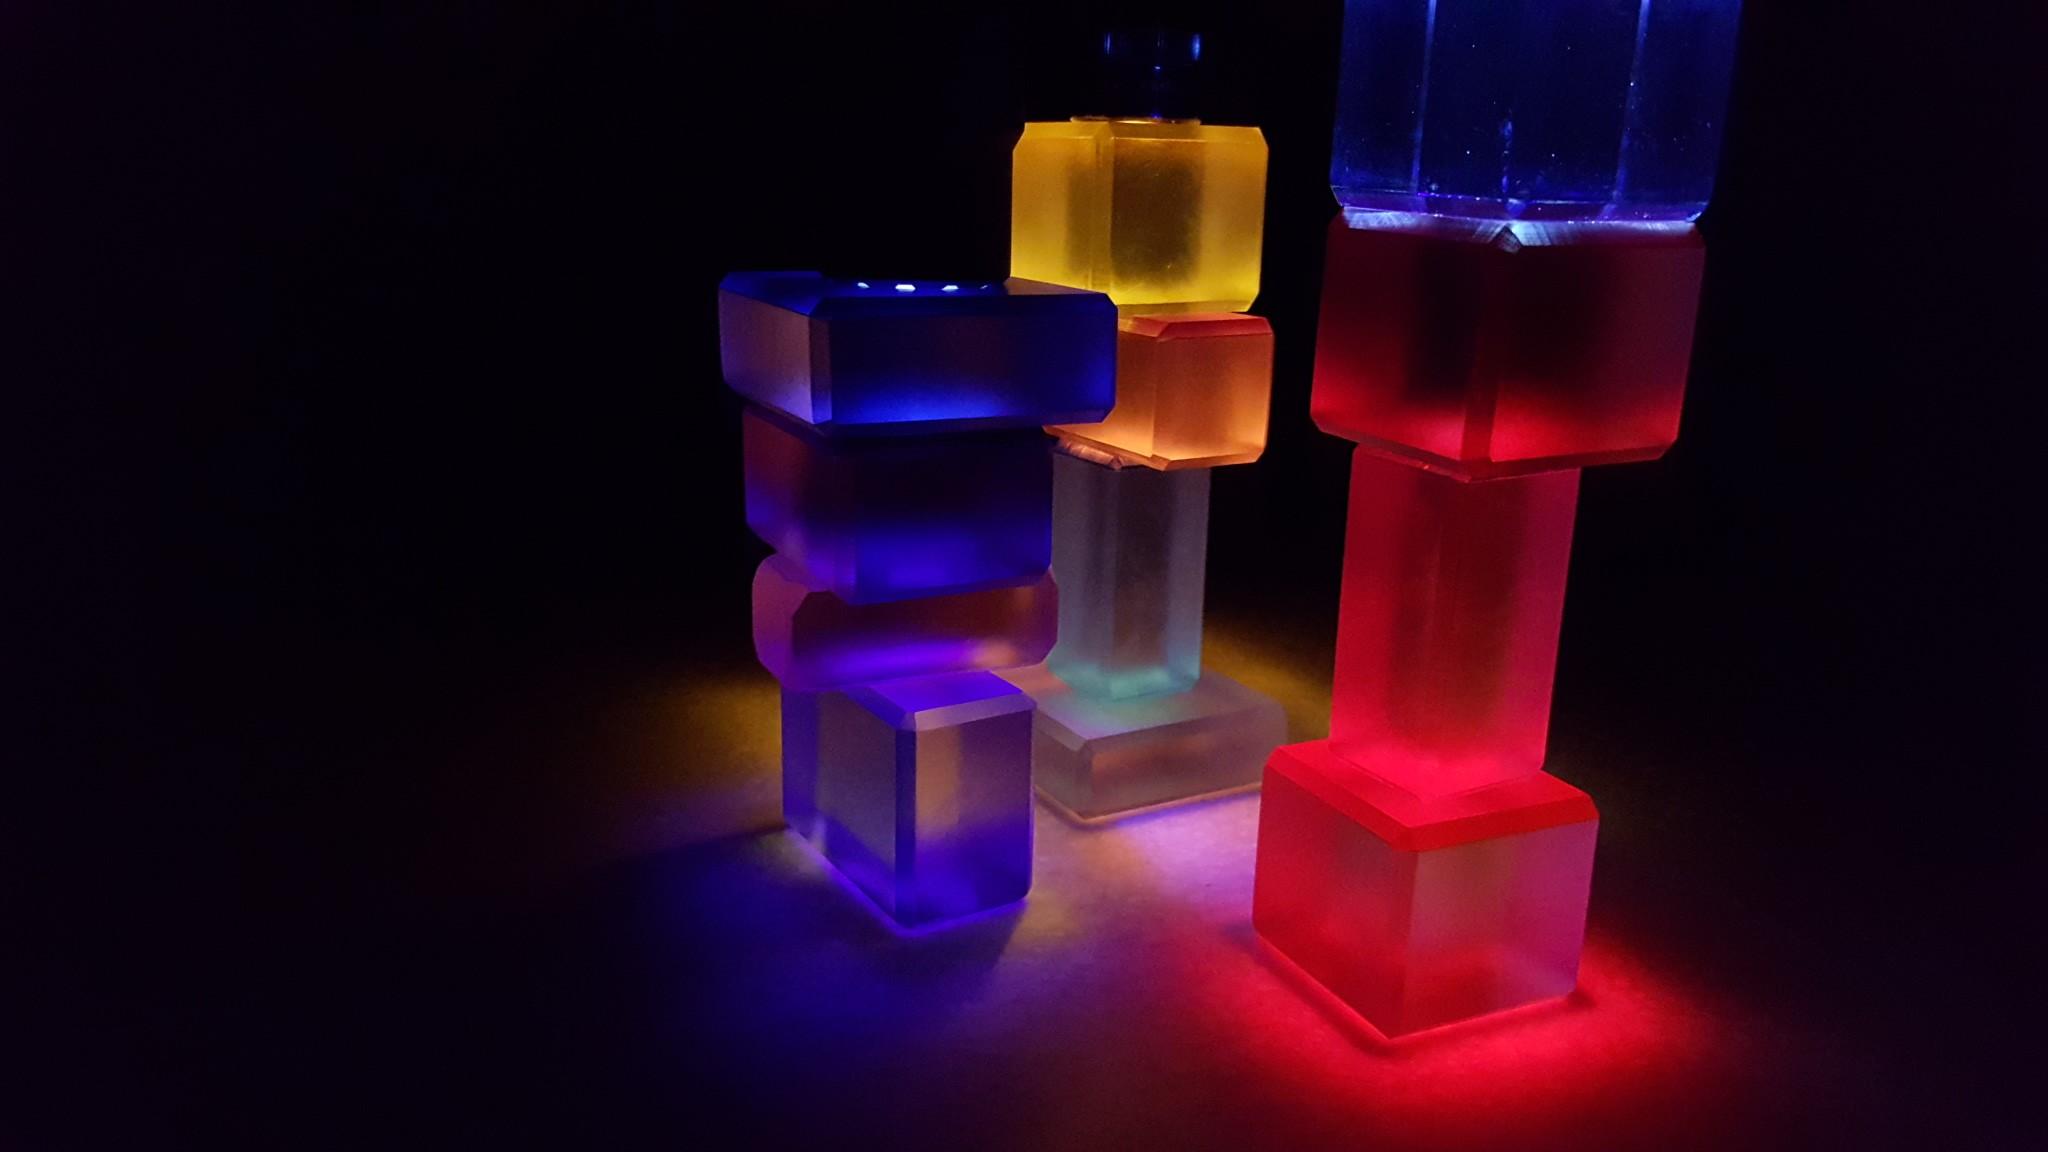 ZonnenBoxen nightclubbing with a flashlight.